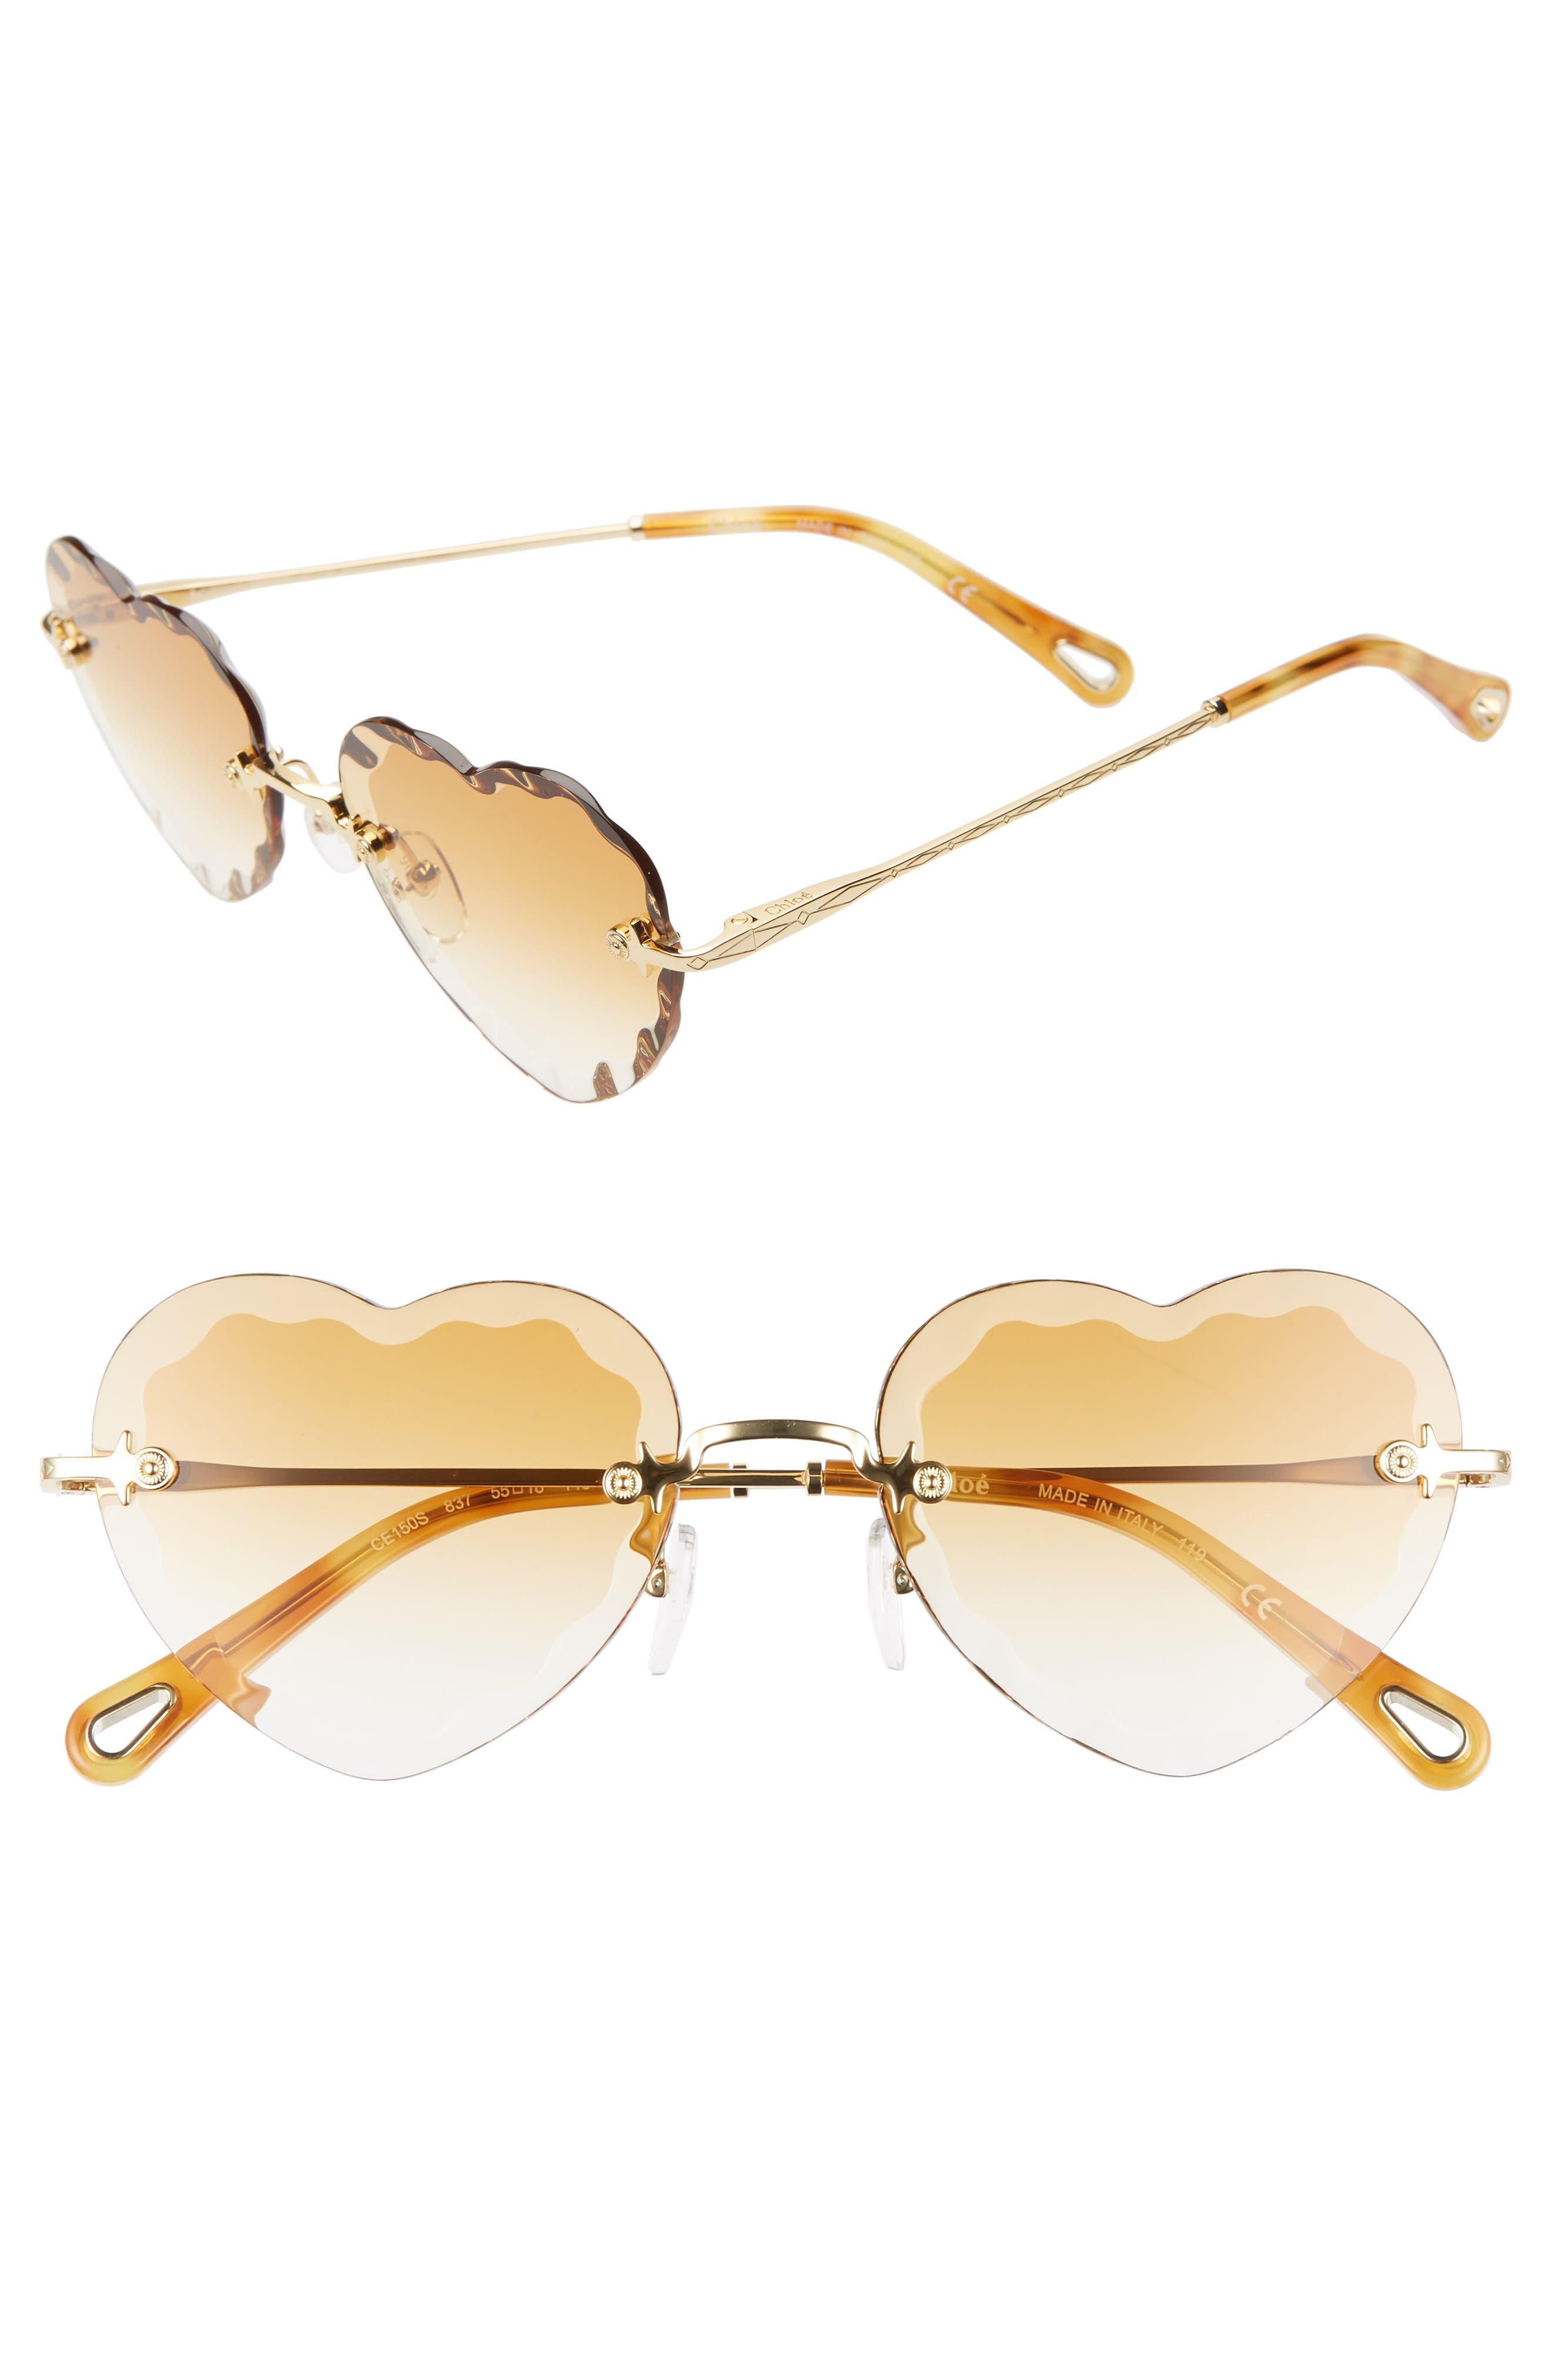 Chloe Rosie 55Mm Heart Shaped Sunglasses - Gradient Brick/ Gold